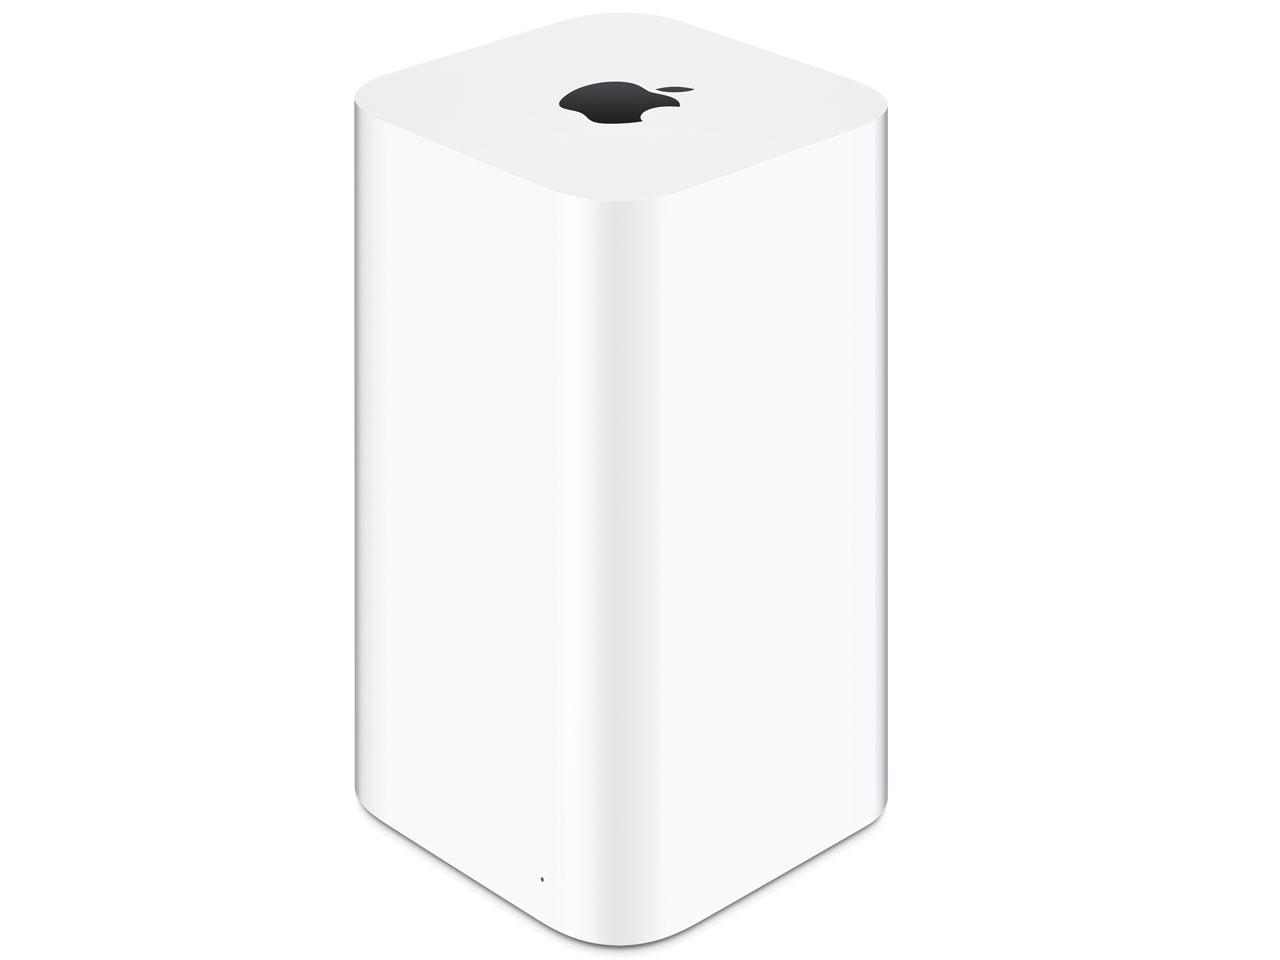 AirMac Time Capsuleの買取実績|スマホ・携帯・iPhone高価買取のモバックス!大阪含め全国12